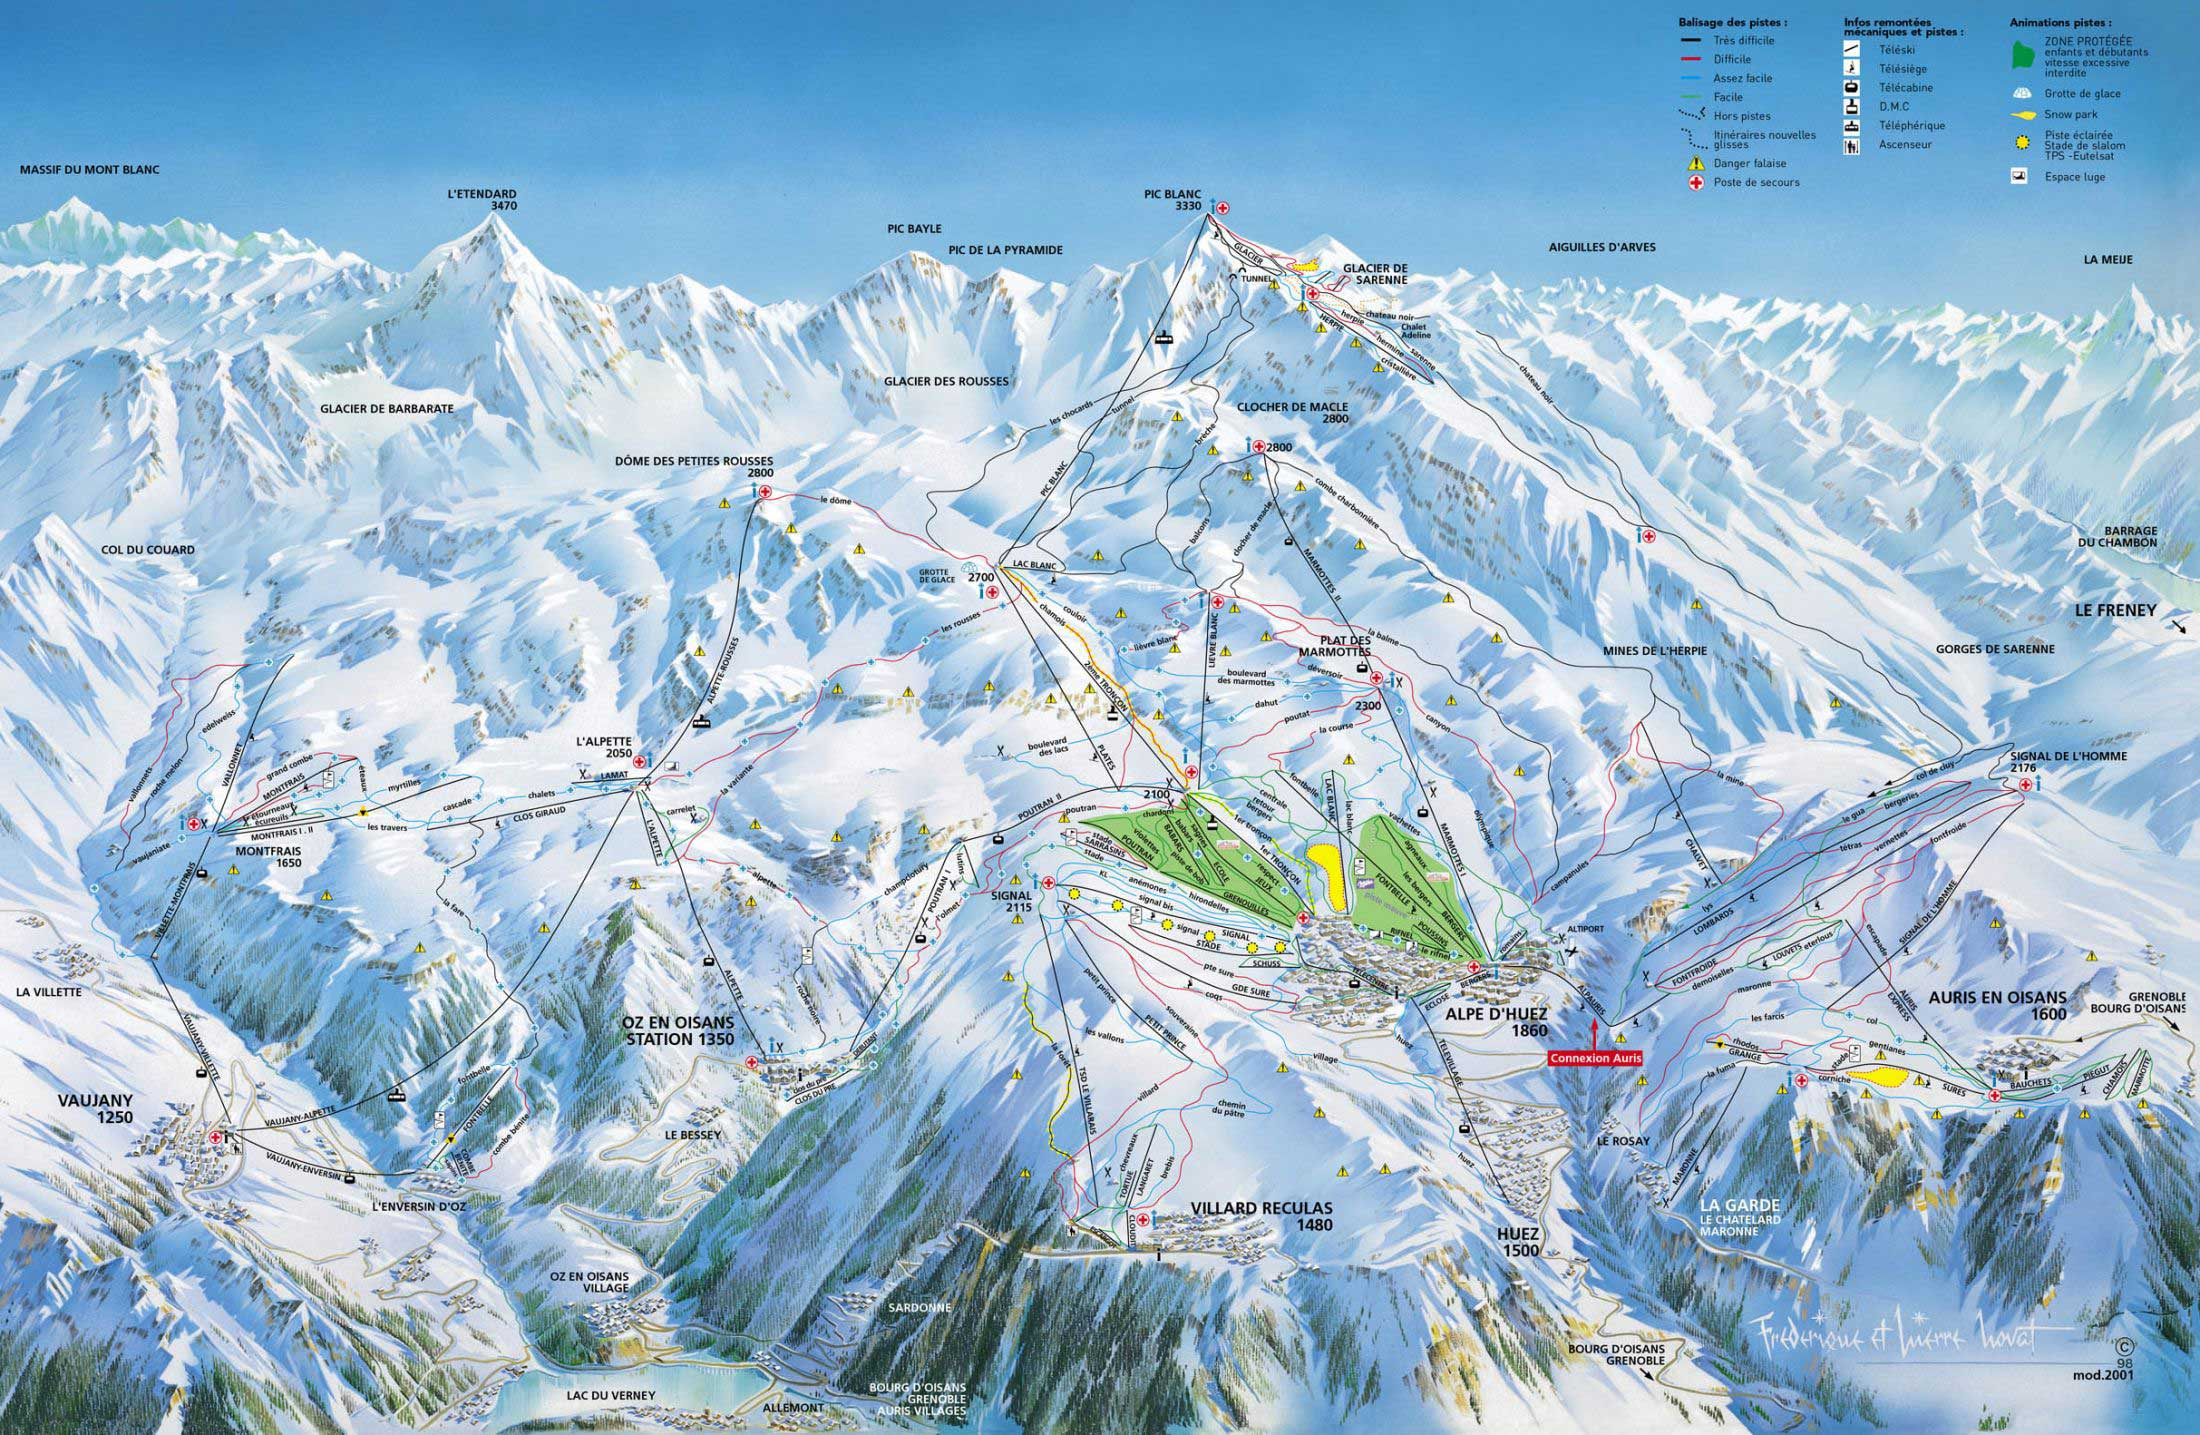 7_skigebied_alpedhuez